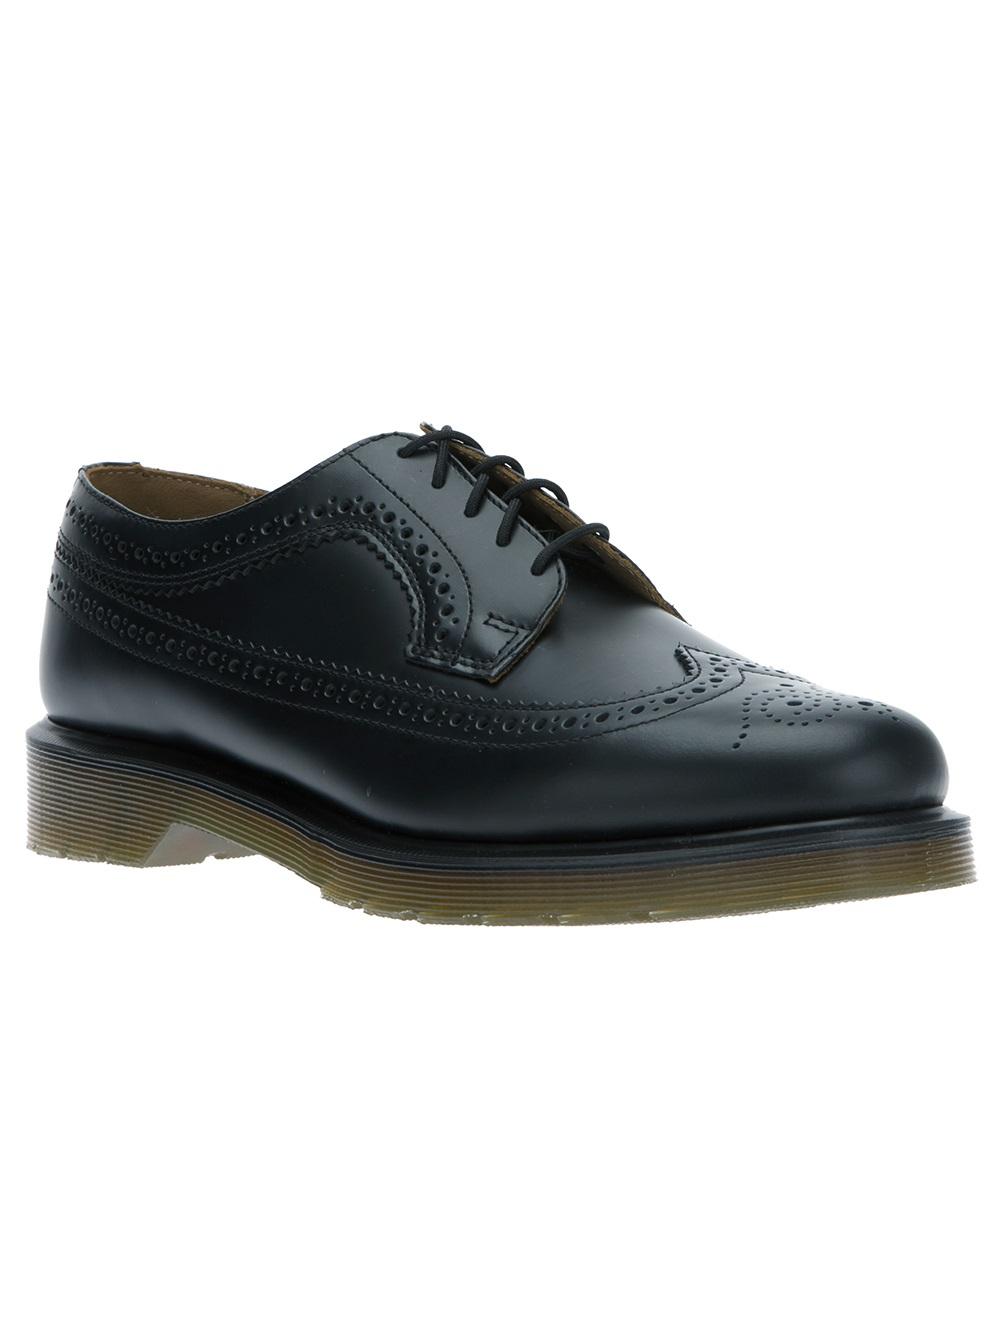 dr martens 3989 brogue shoe in black lyst